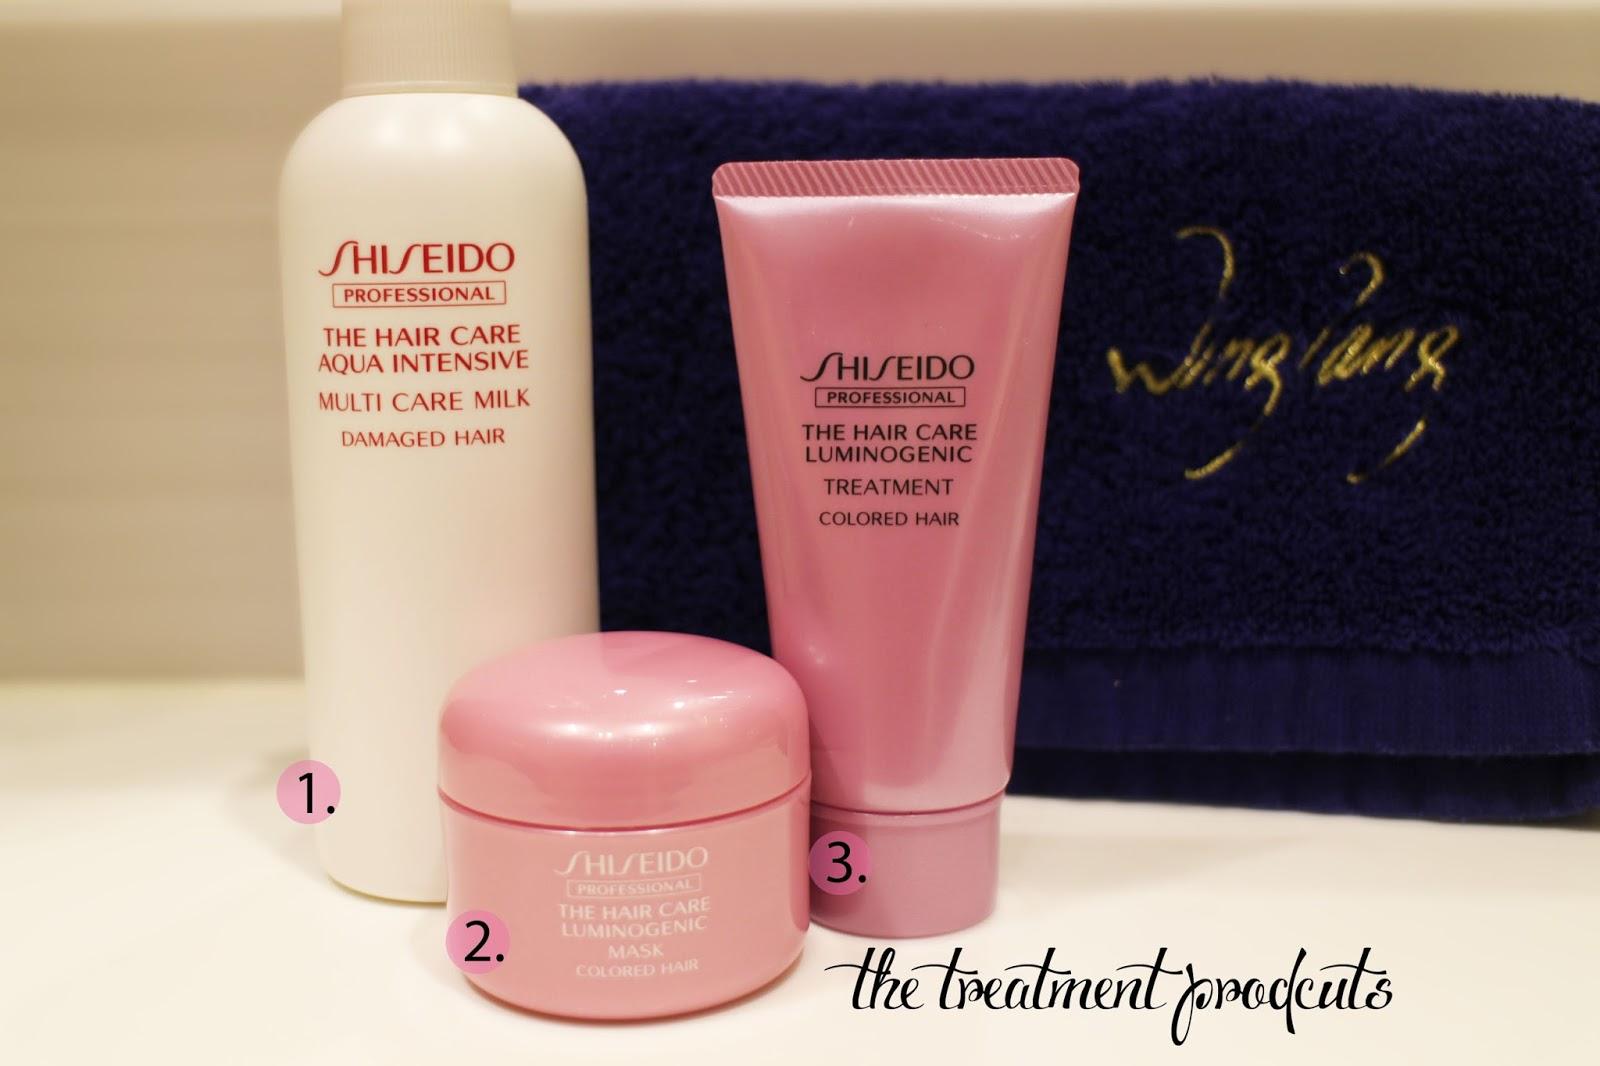 Shiseido hair care multi treatment